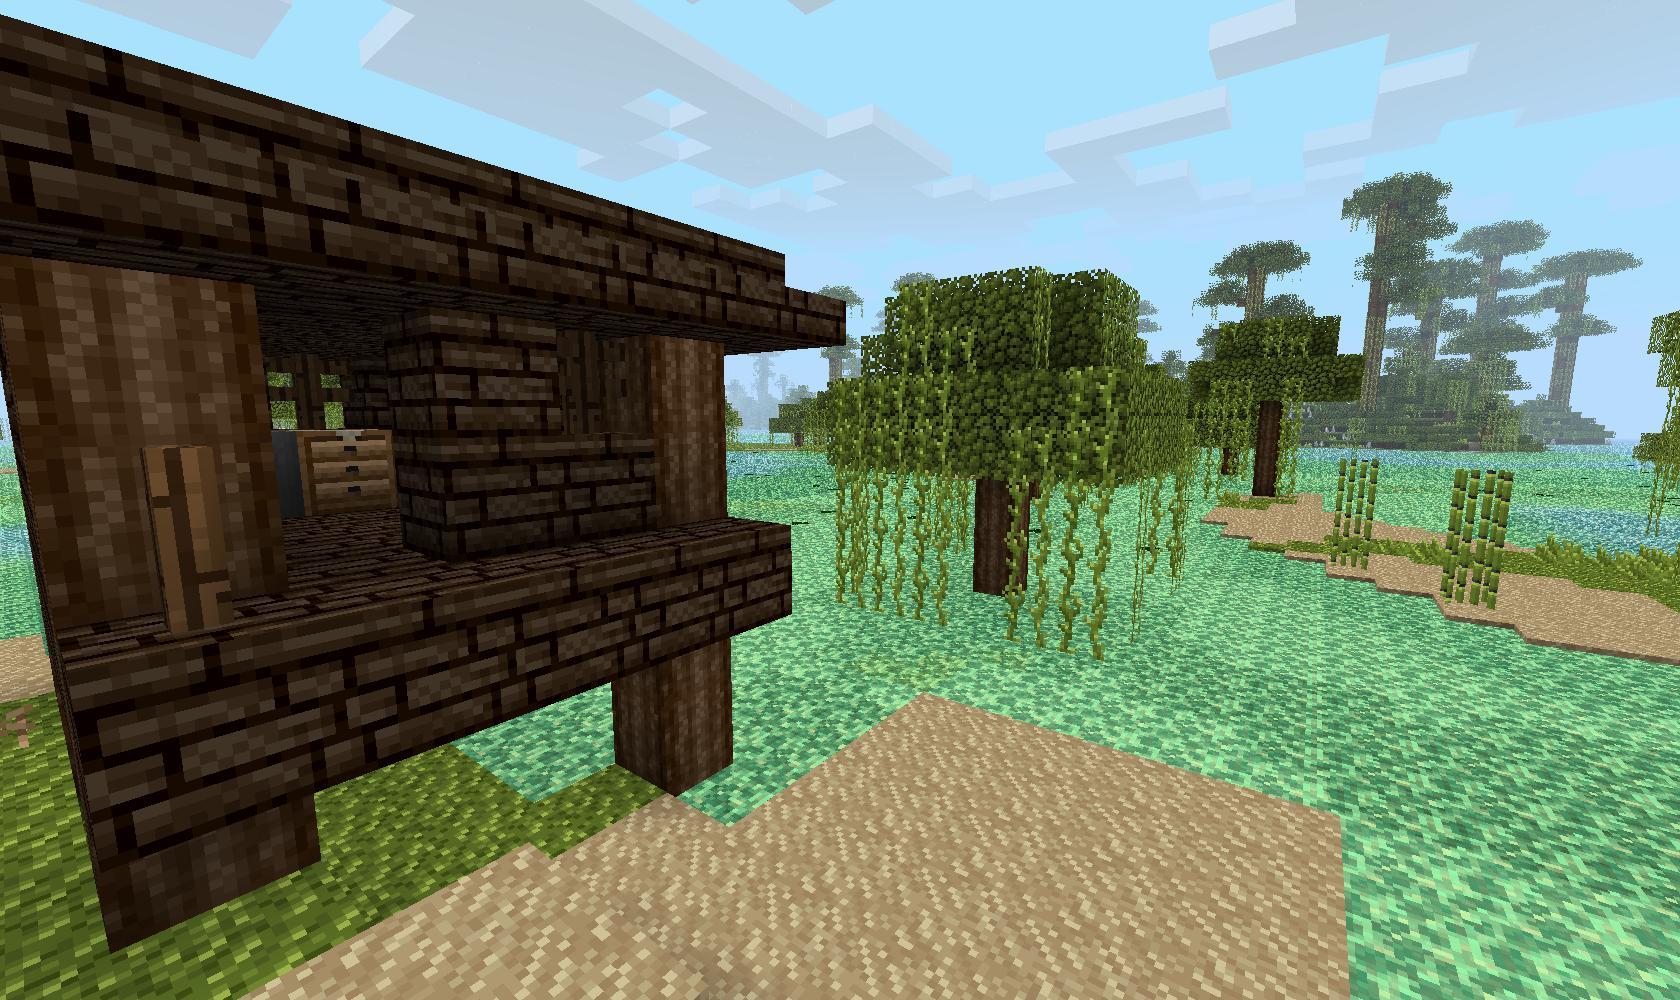 http://minecraft-forum.net/wp-content/uploads/2012/11/c1050__Solstice-texture-pack-4.jpg